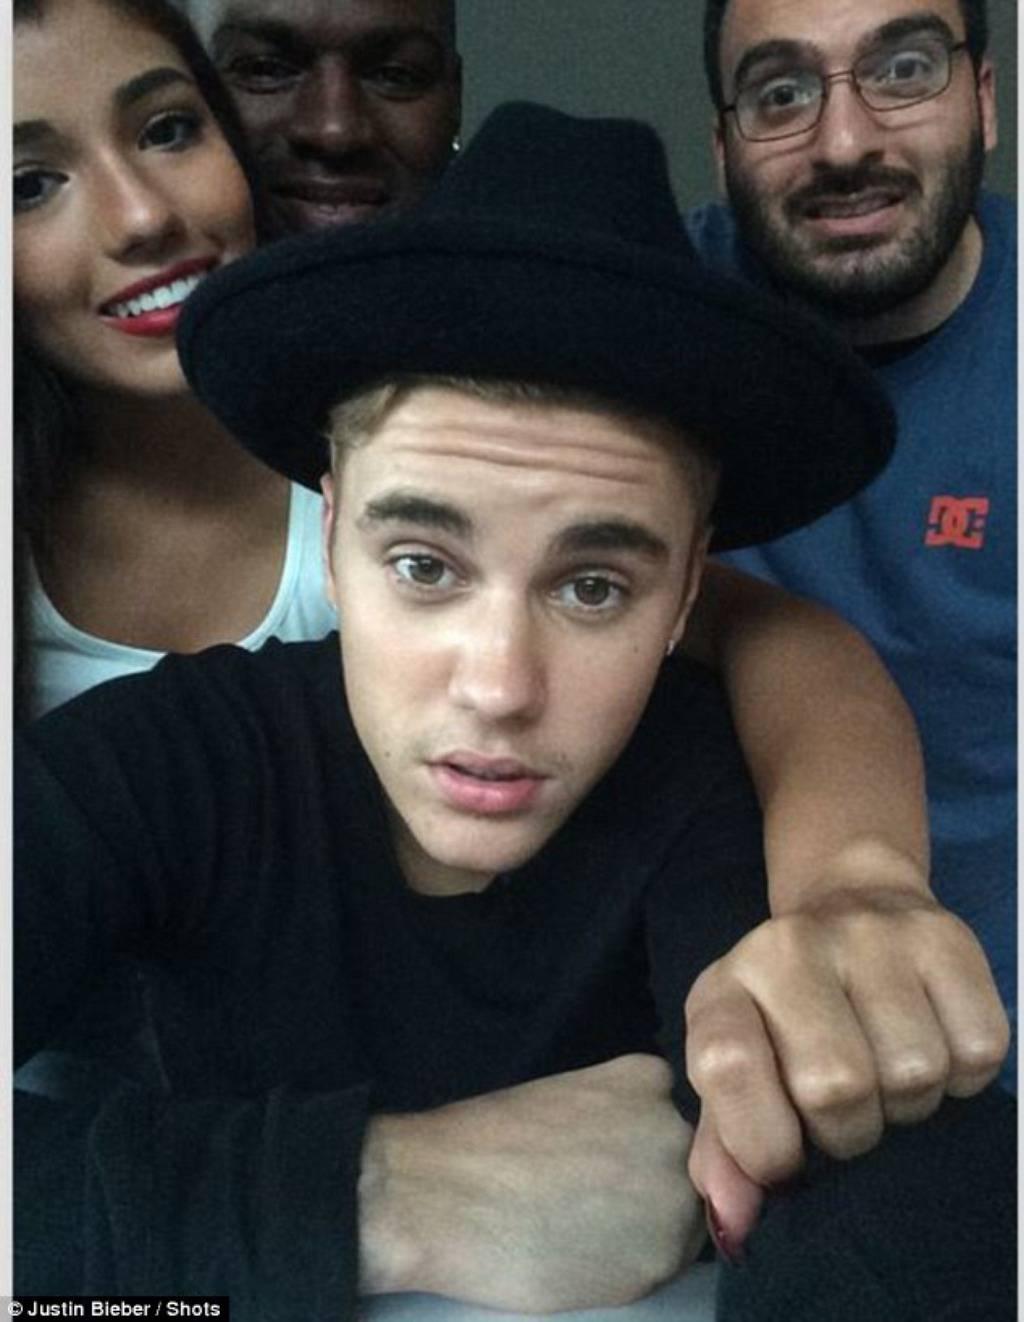 Justin Bieber/Shots